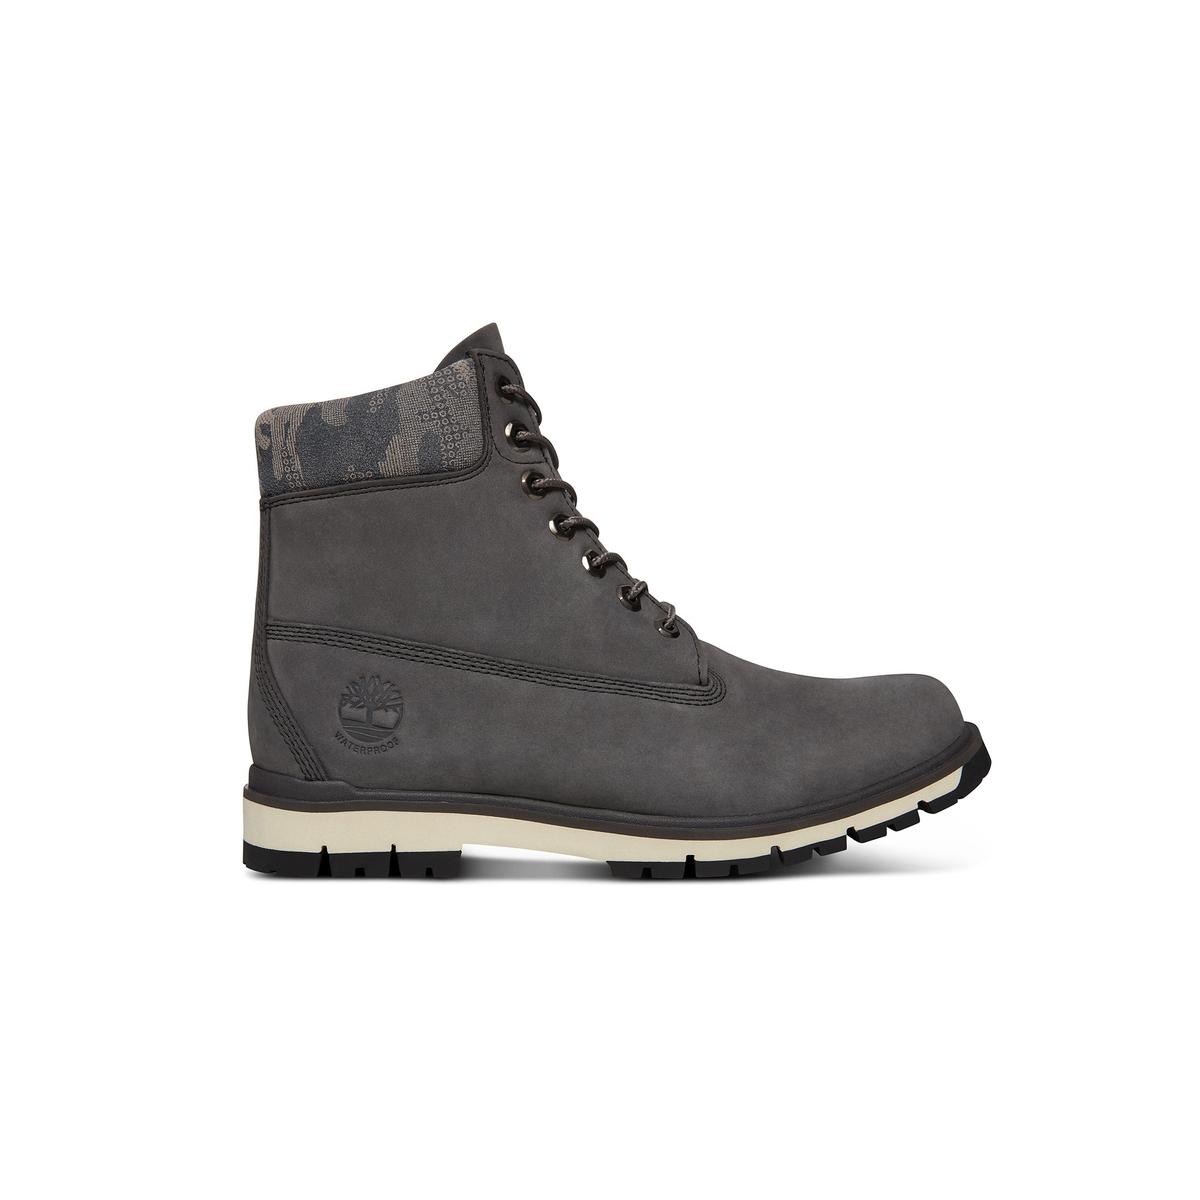 Botines de piel Radford 6 Boot WP